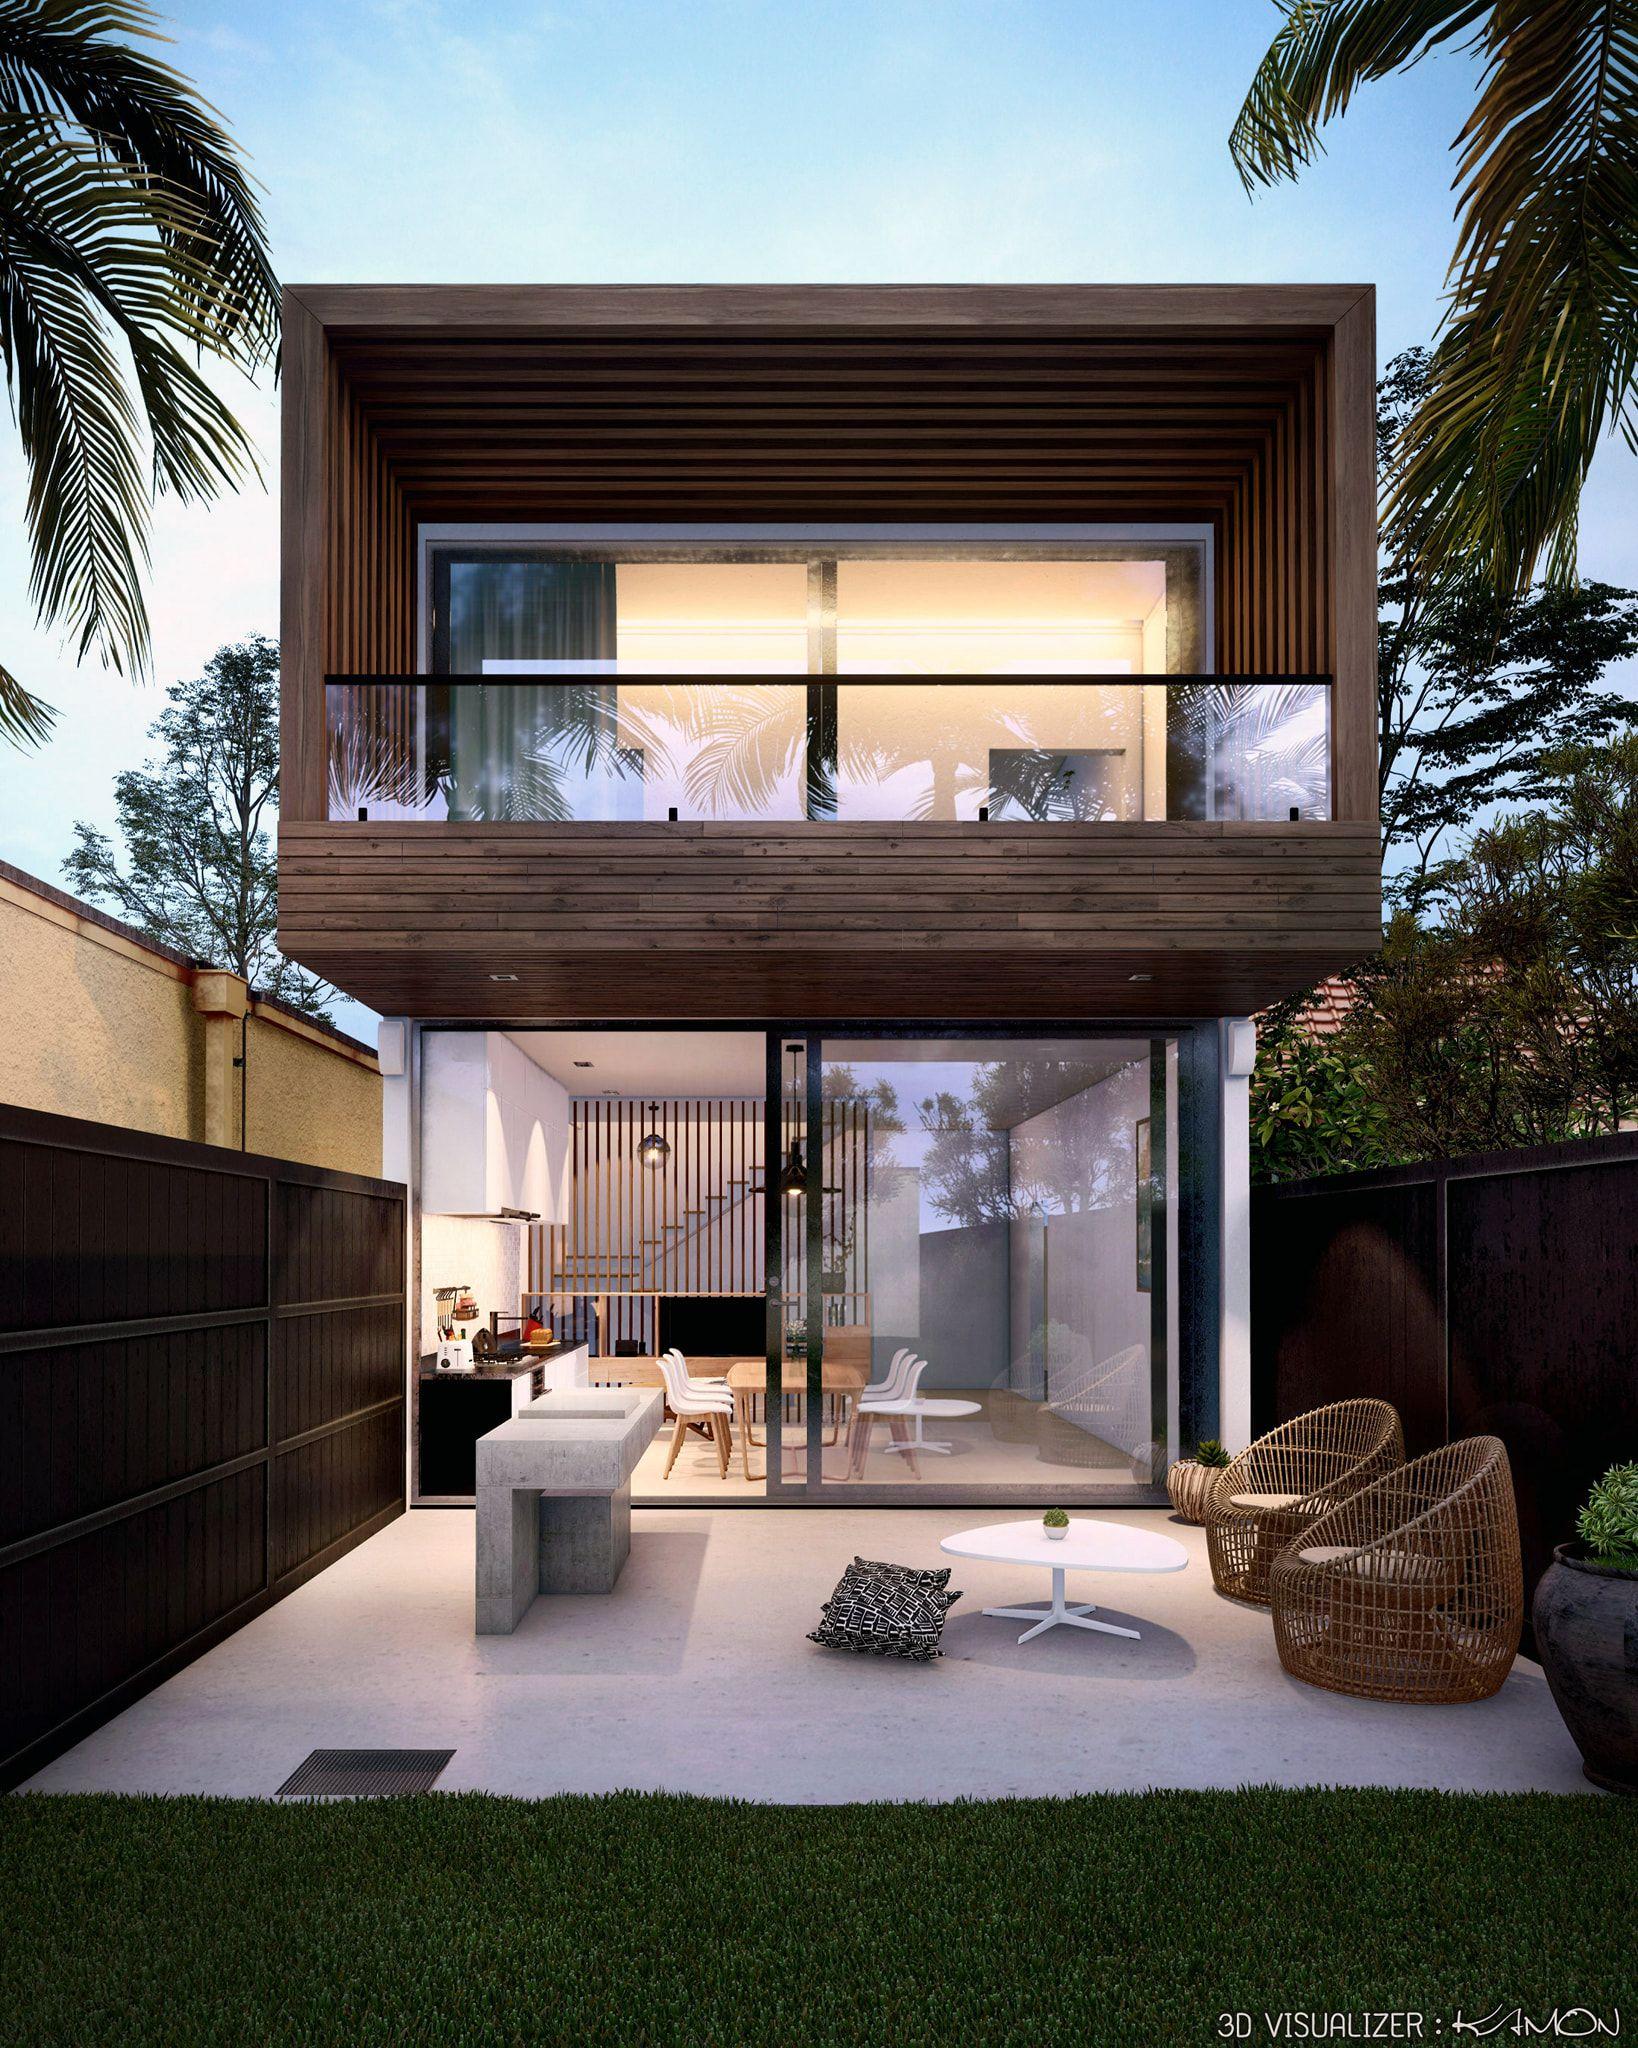 Backyard Loft House Design Loft House Modern Small House Design